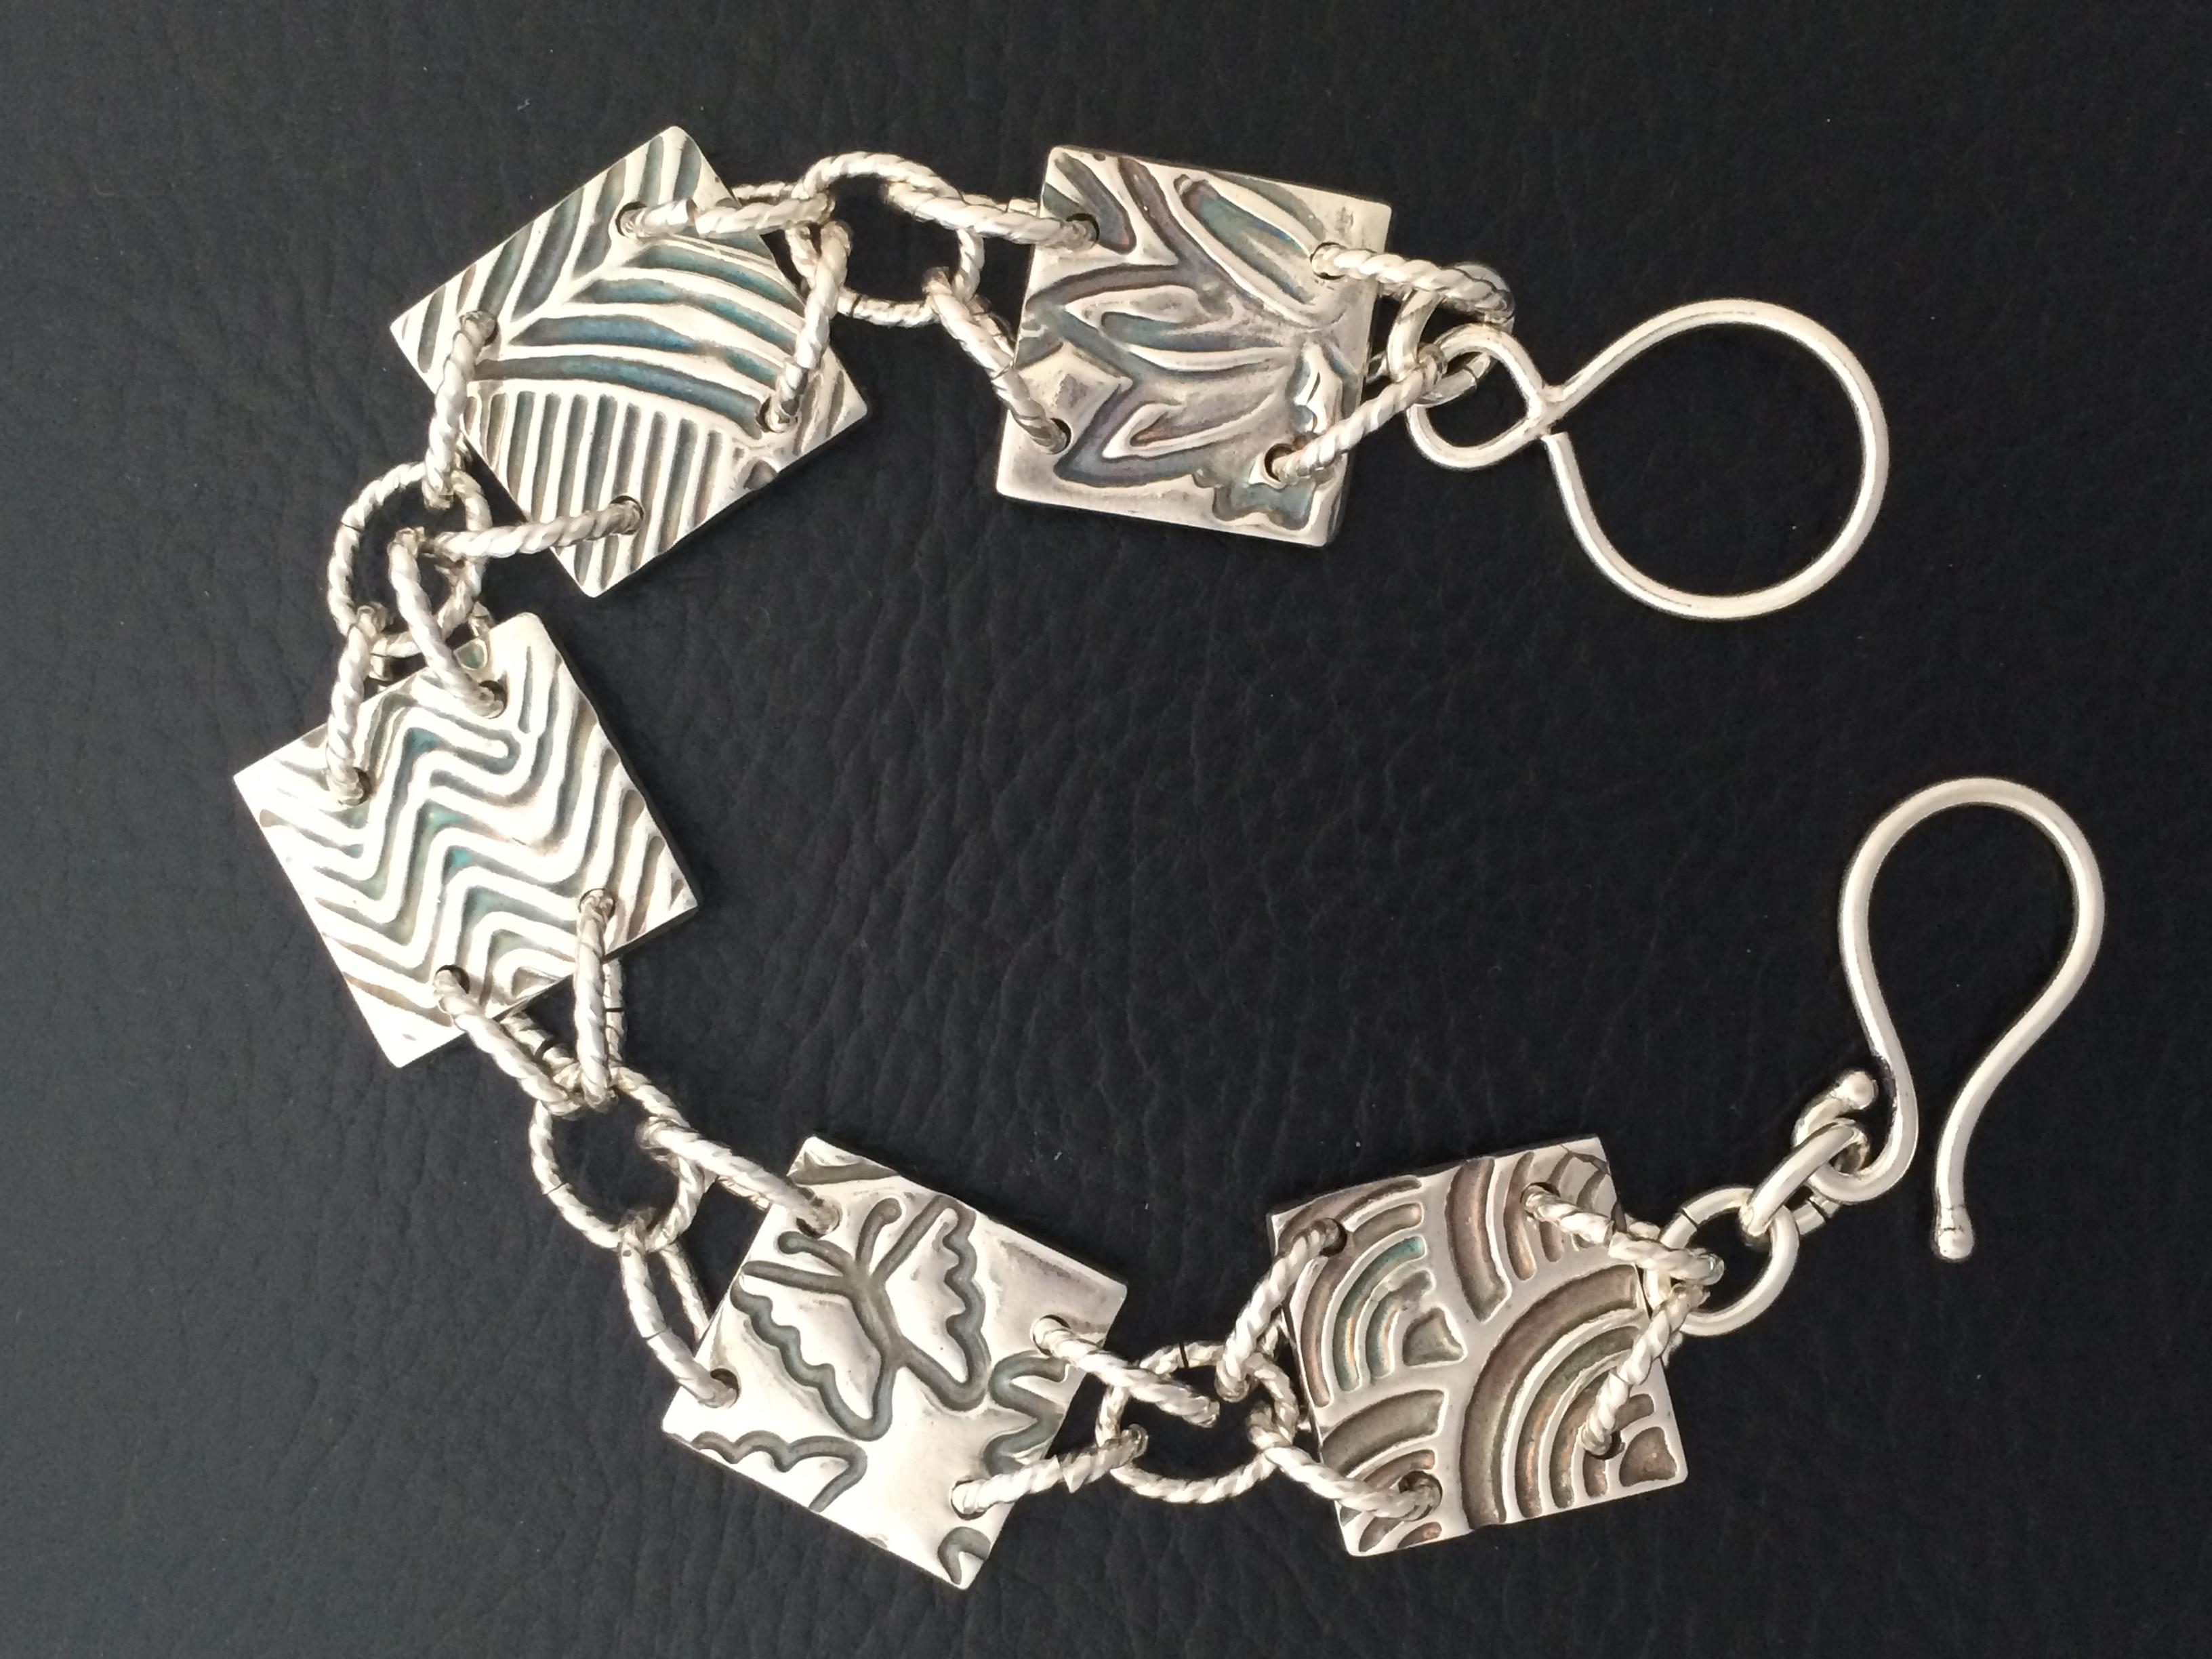 Bracelet-sampler